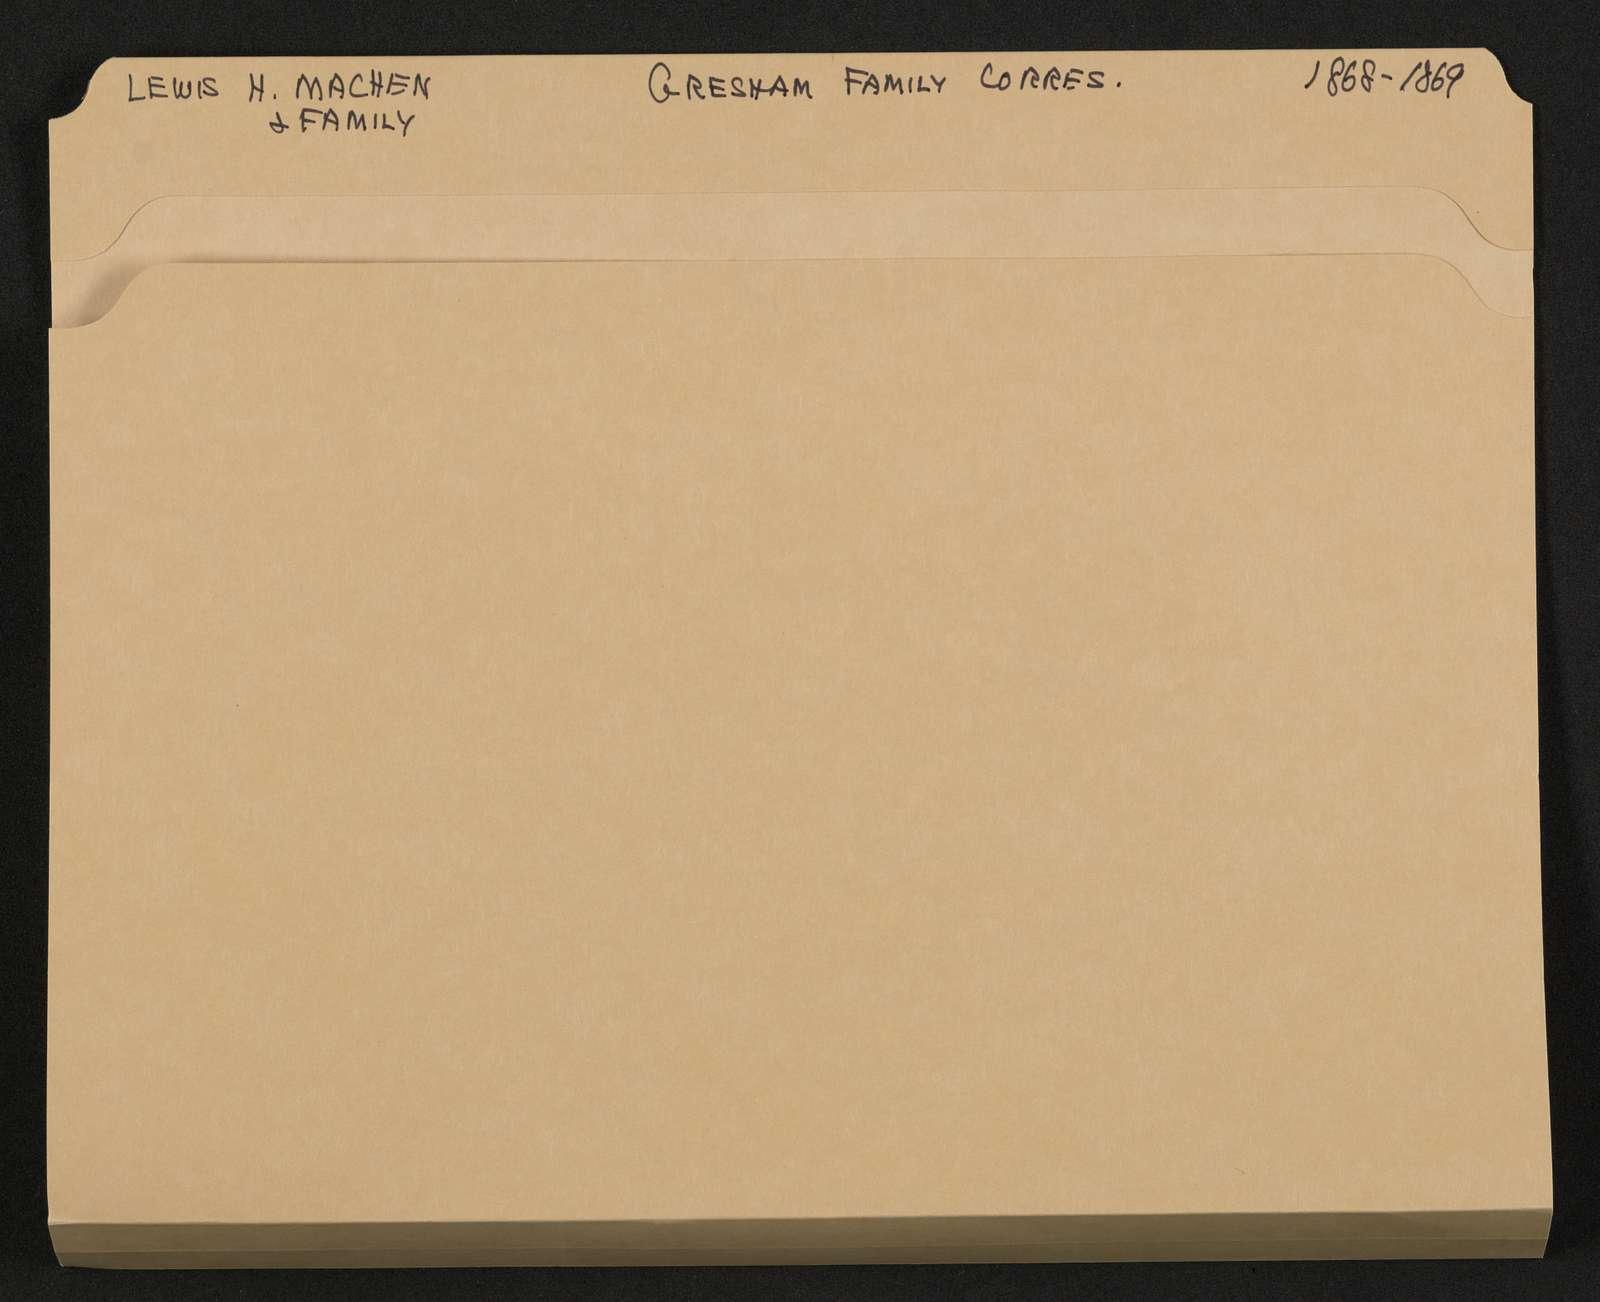 Lewis H. Machen Family Papers: Gresham Family Correspondence, 1834-1925; 1868-1869